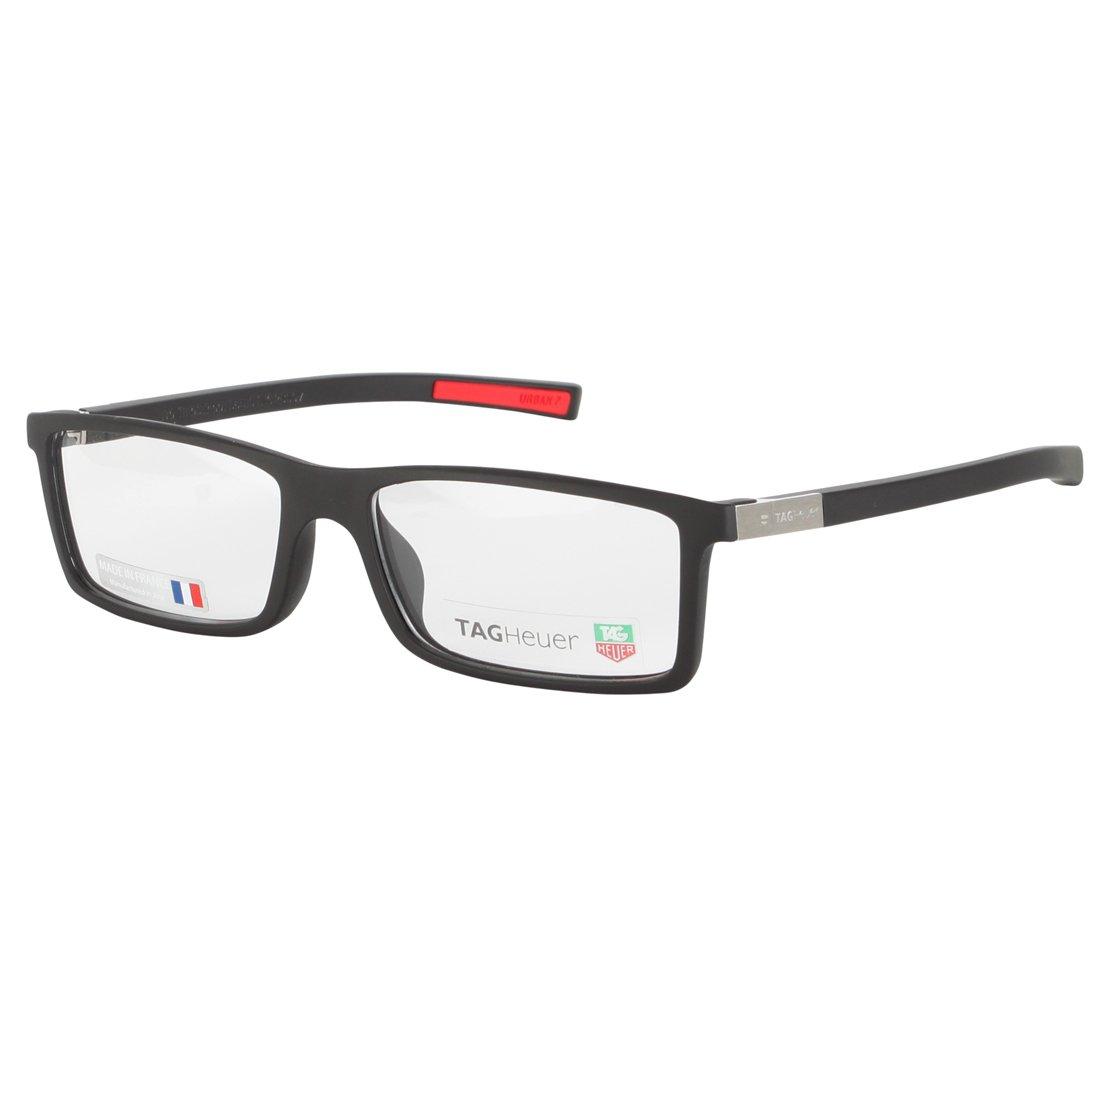 Straight Temple Glasses Frame : TAG Heuer Mens 0512 001 Urban 7 Full Frame Designers ...